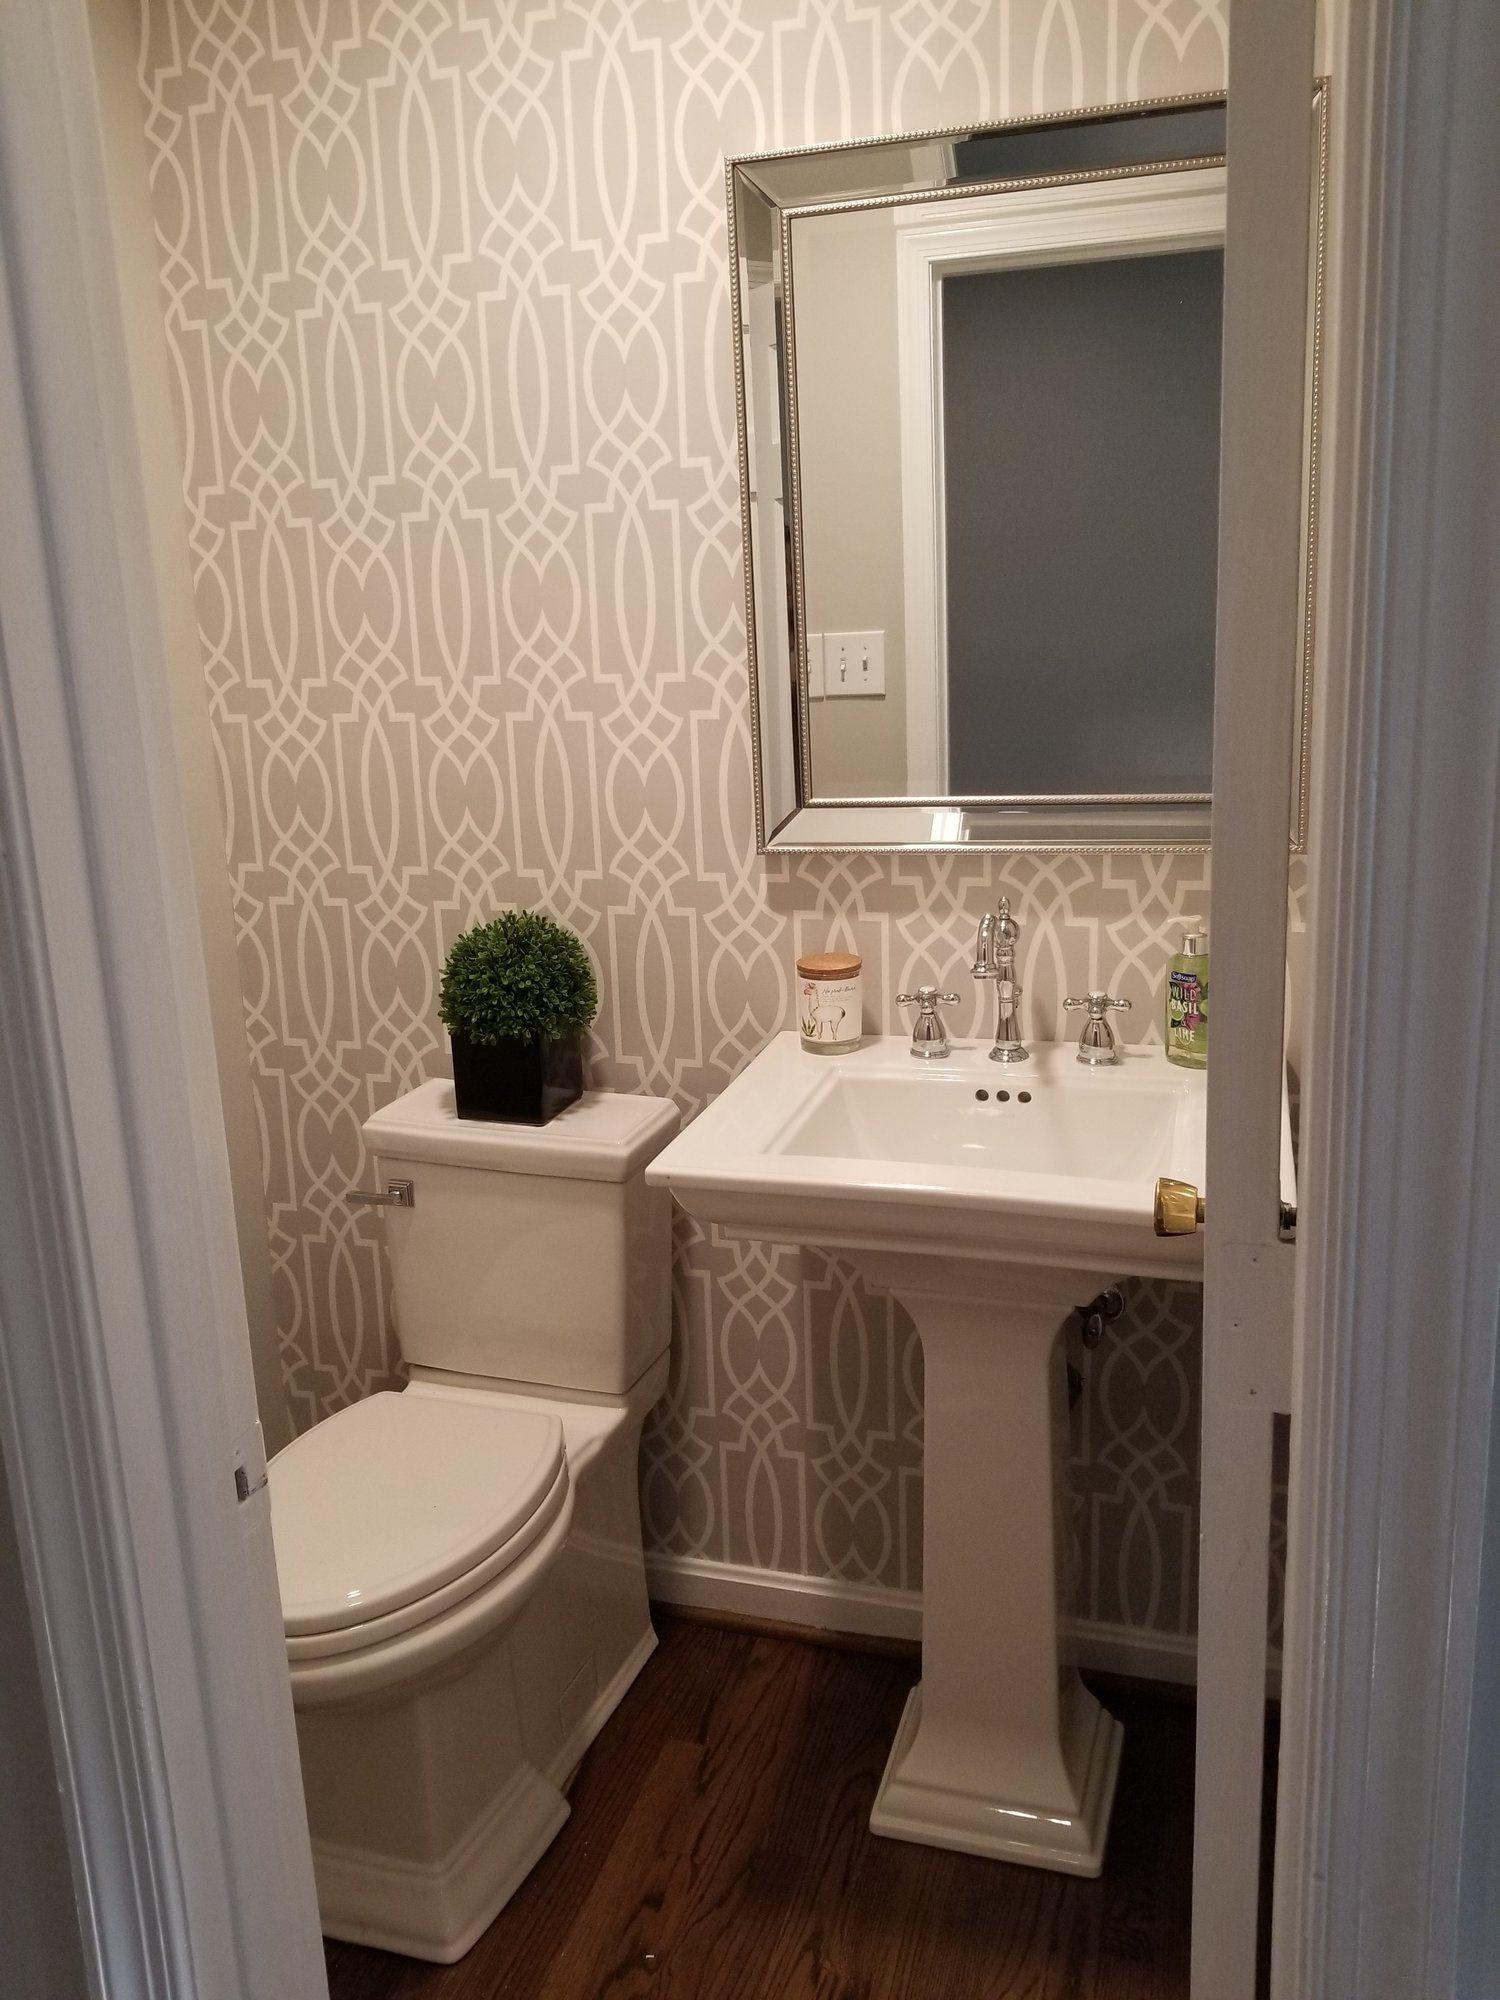 Half Bath Update Small Bathroom Wallpaper Bathroom Wallpaper Small Half Baths